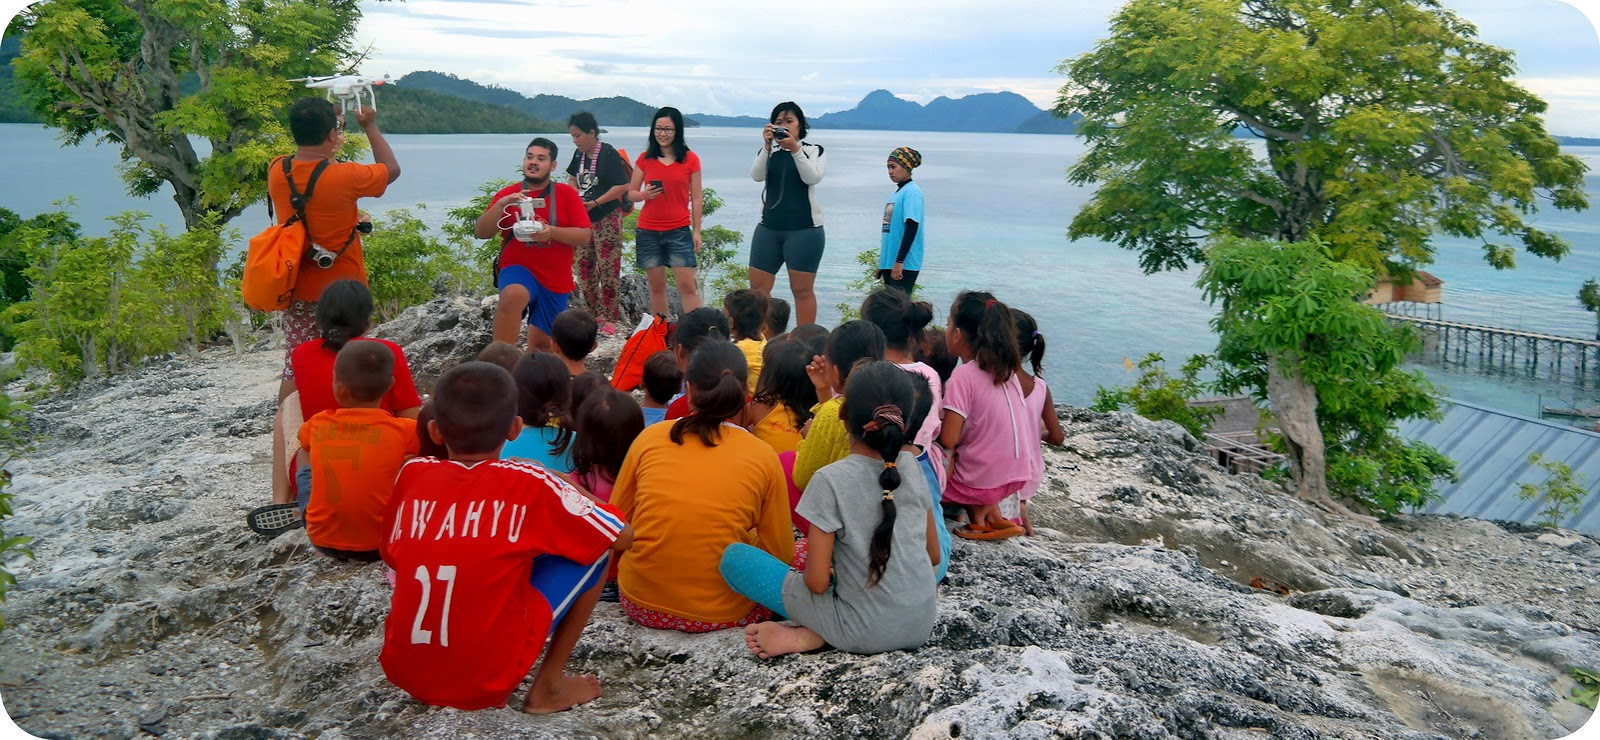 Sulawesi Archives Blog Indonesia Tcash Vaganza 17 Varka V189 Sepatu Casual Dan Olahraga Wanita Anak Suku Bajo Togean